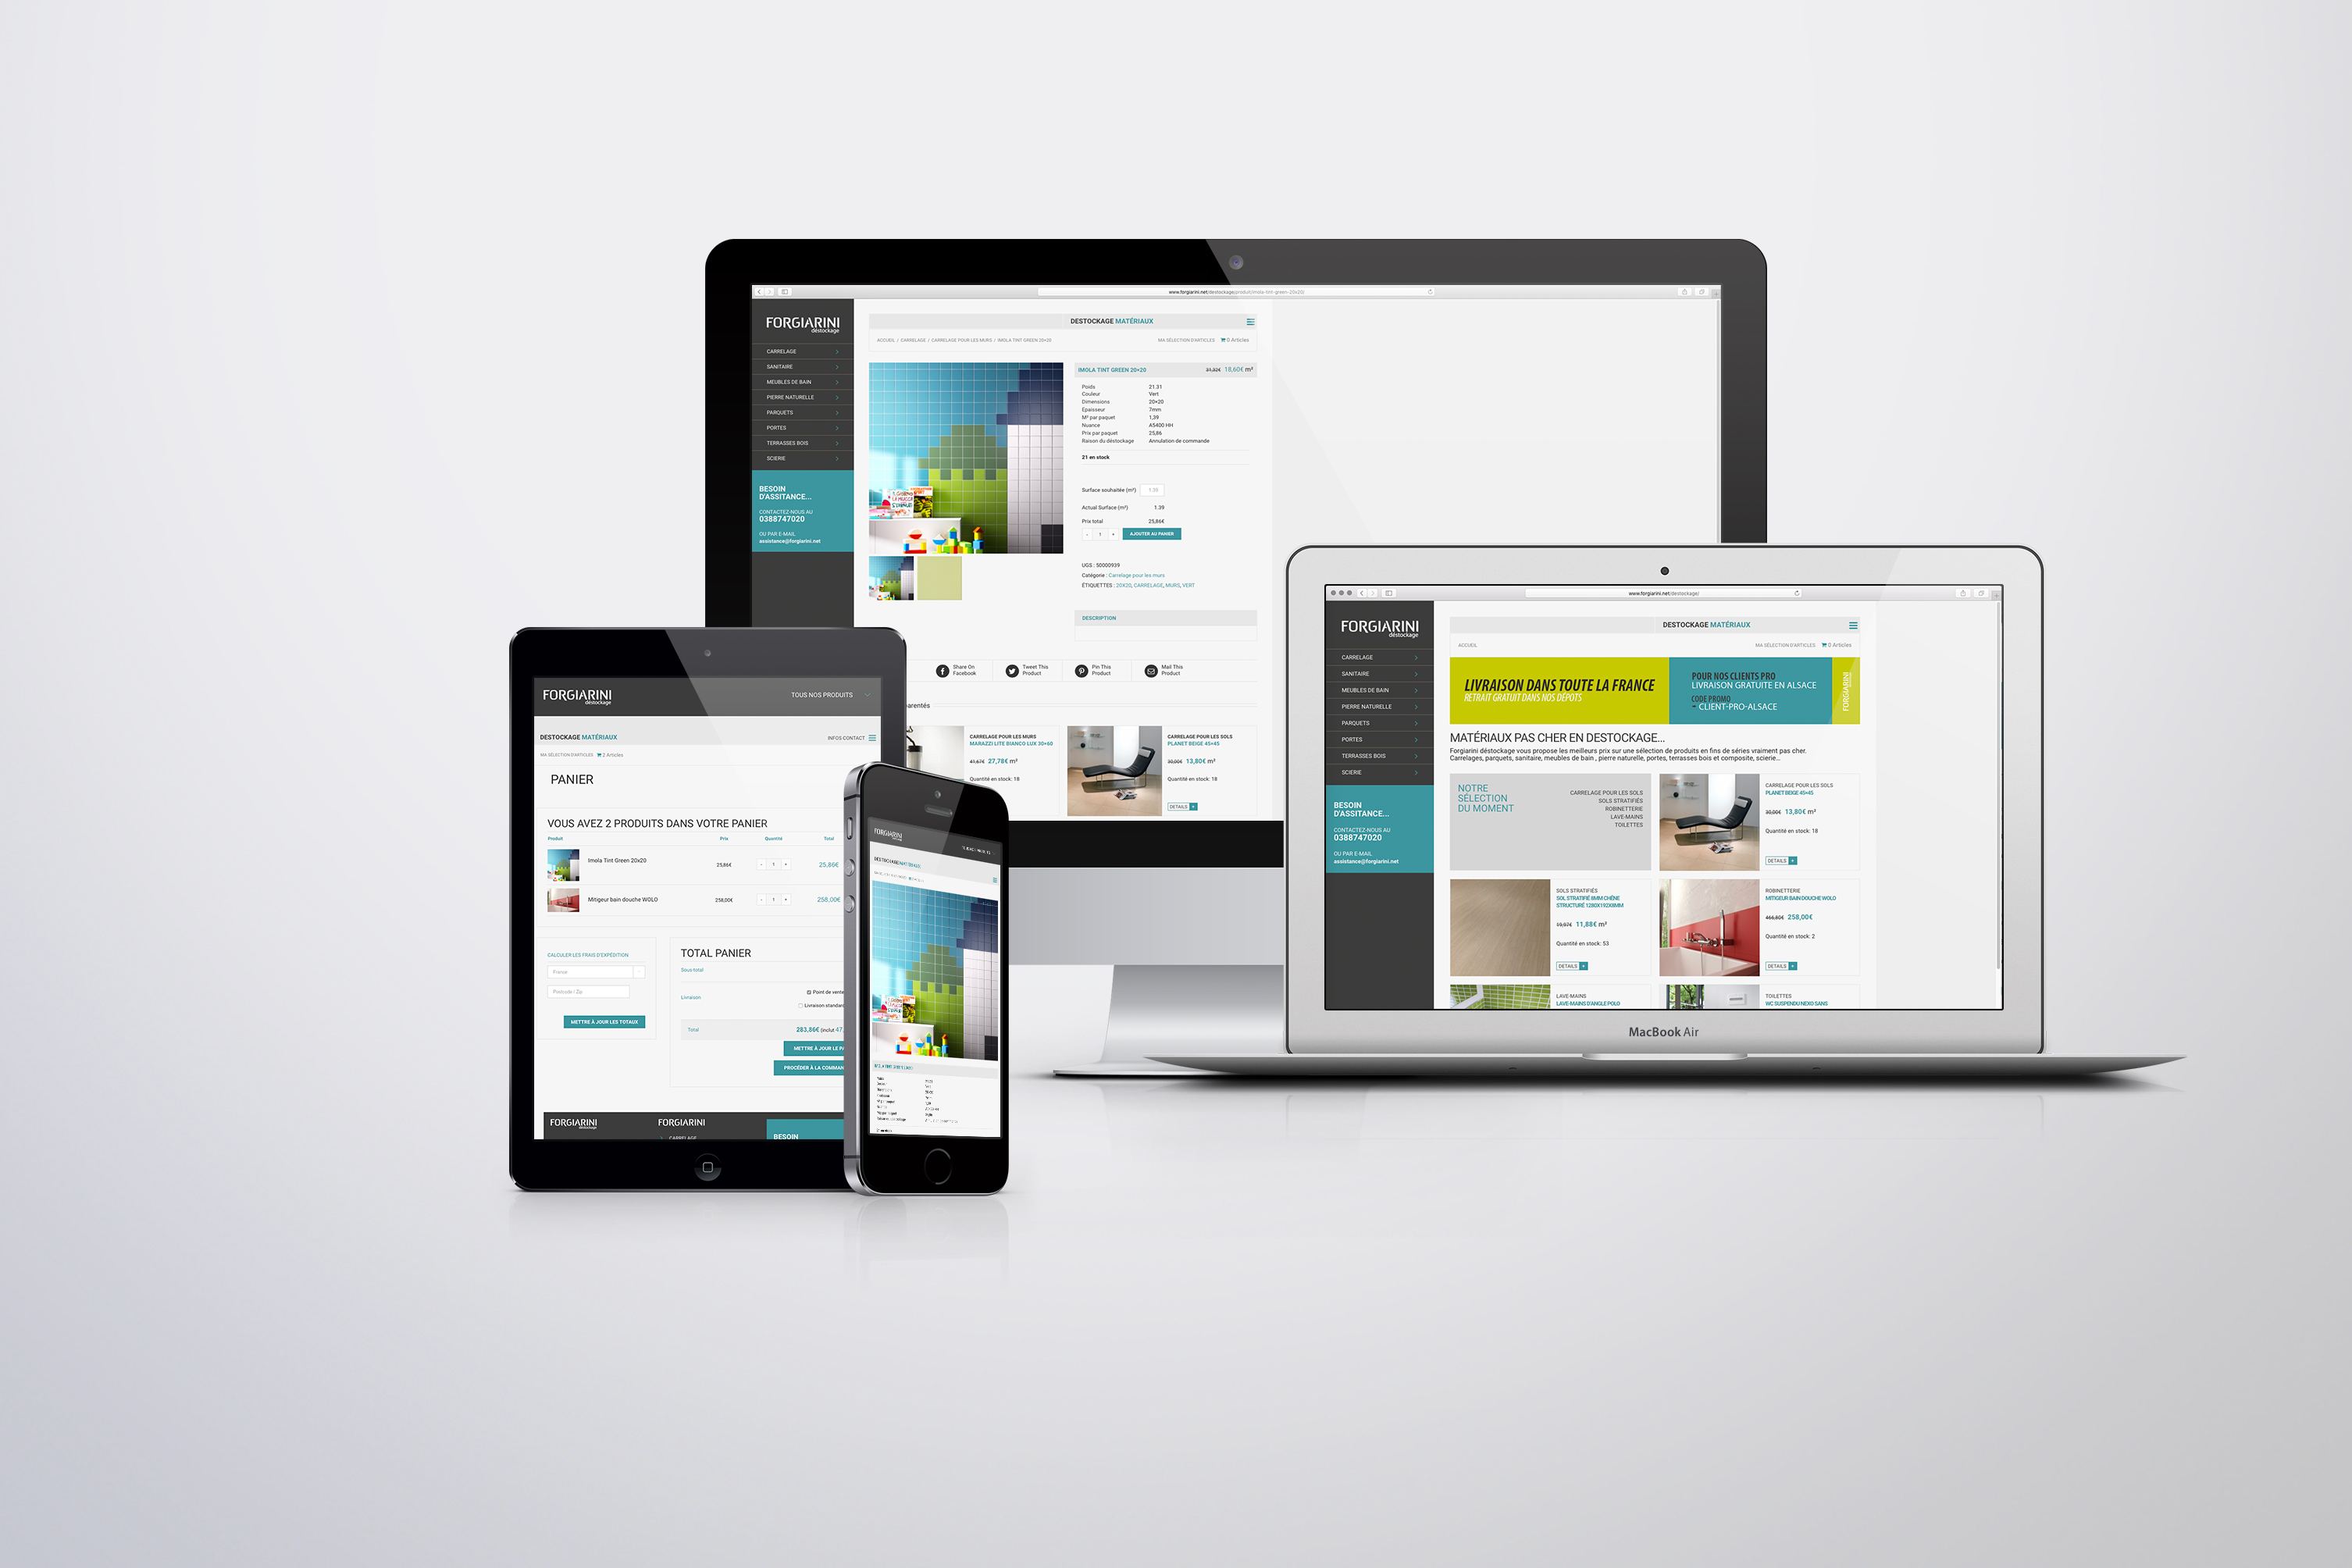 site intenet forgiarini destockage webdesign strasbourg. Black Bedroom Furniture Sets. Home Design Ideas